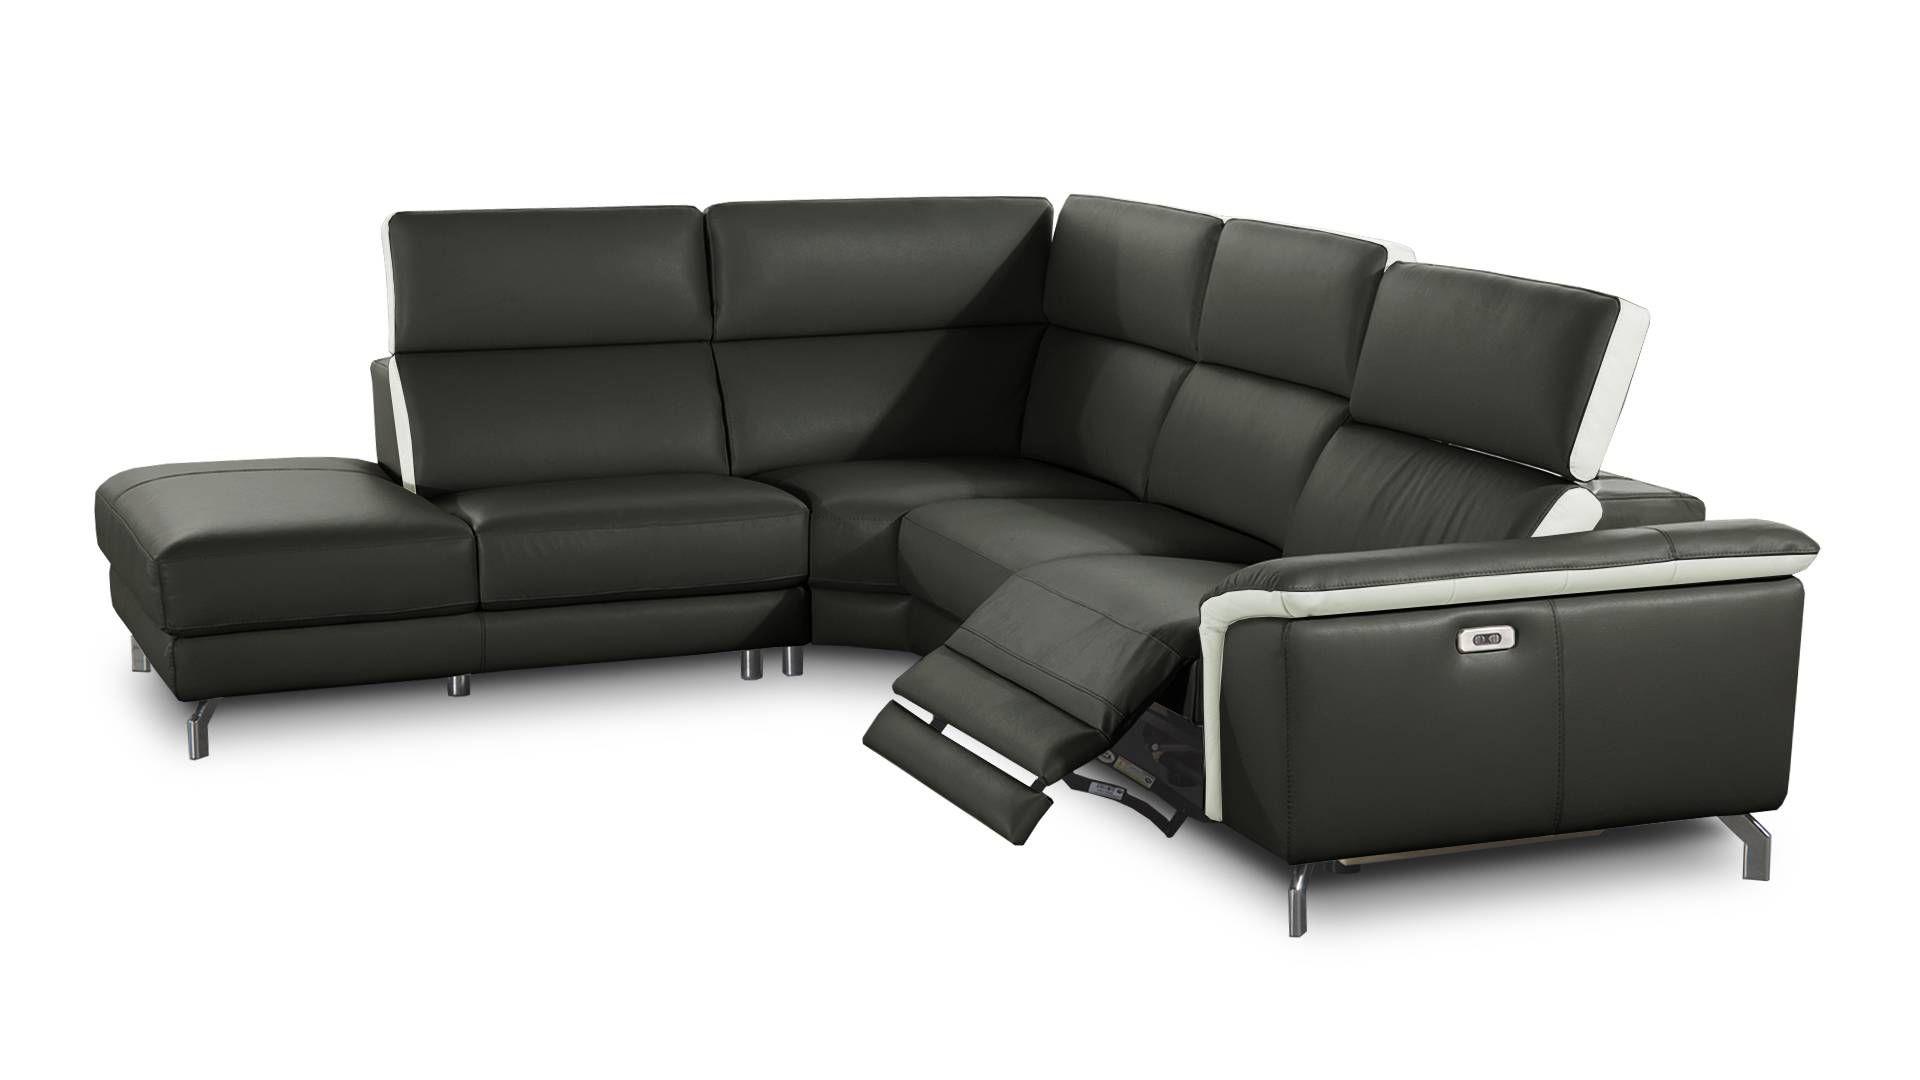 Canape Cuir Relax Electrique Conforama Canapé D Angle Cuir ... pour Canapé D'Angle Arrondi Conforama